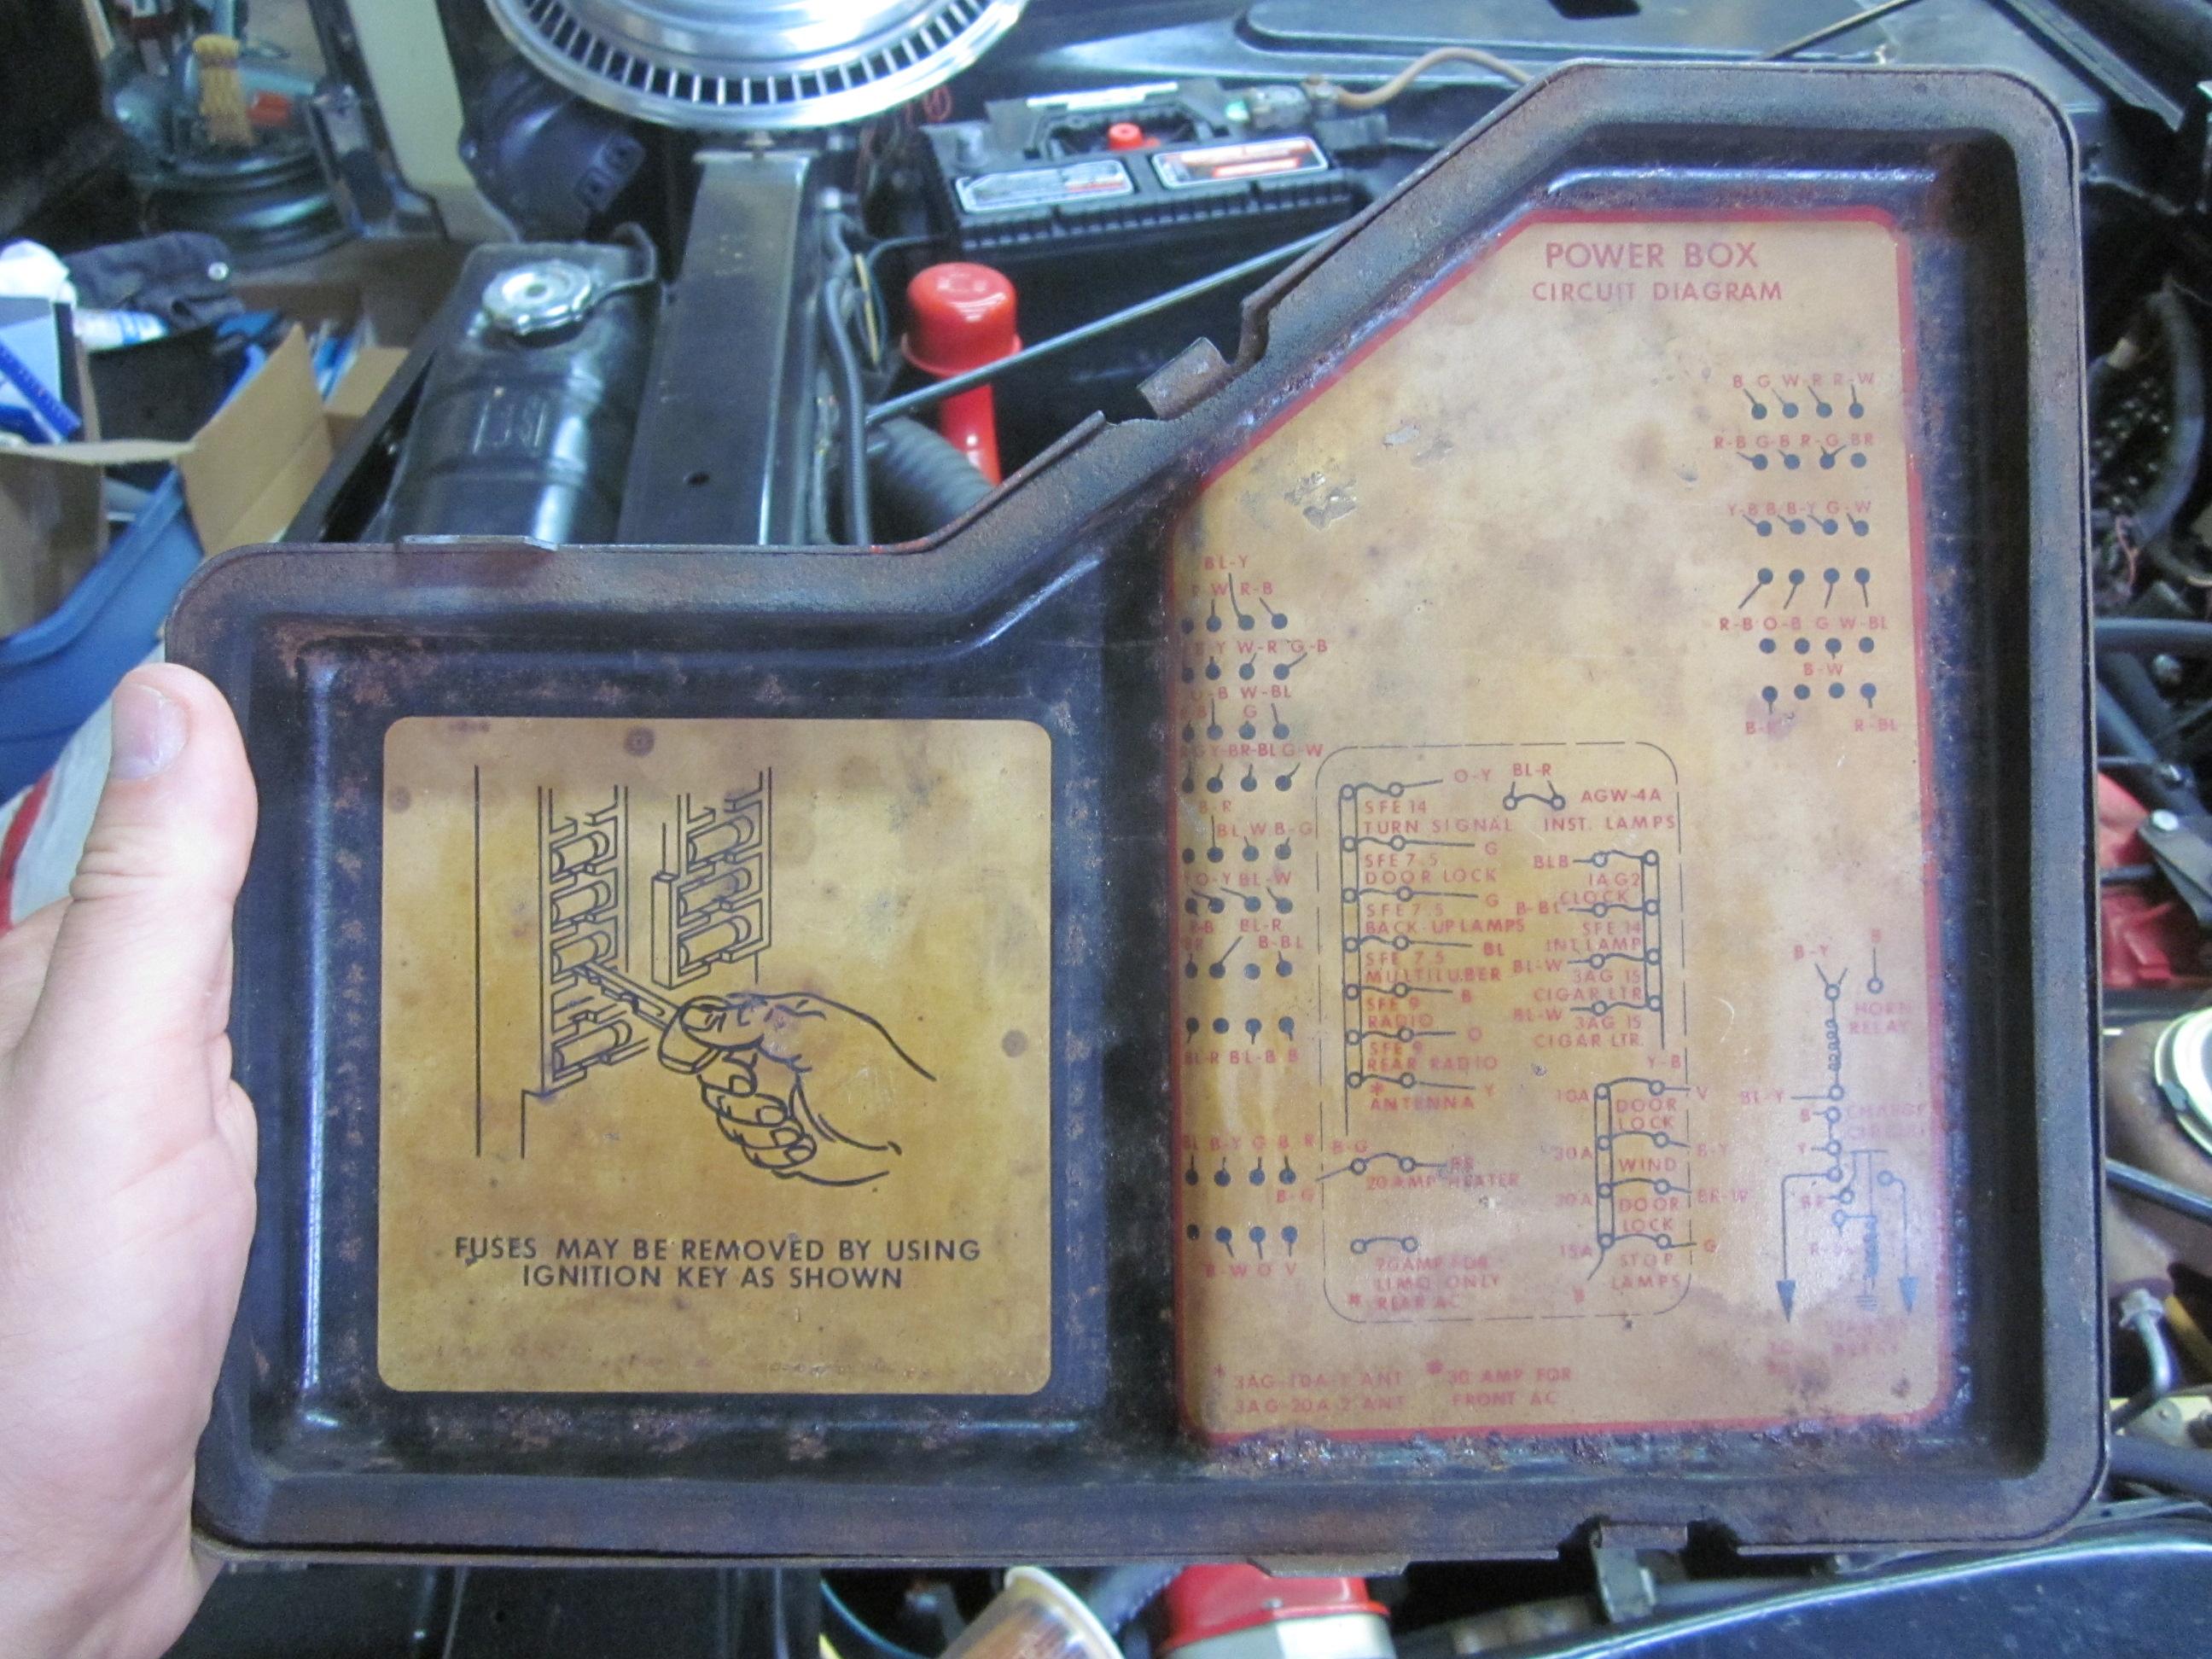 1975 camaro fuse box wiring diagram1975 camaro fuse box wiring diagram1961  corvette fuse box wiring diagram